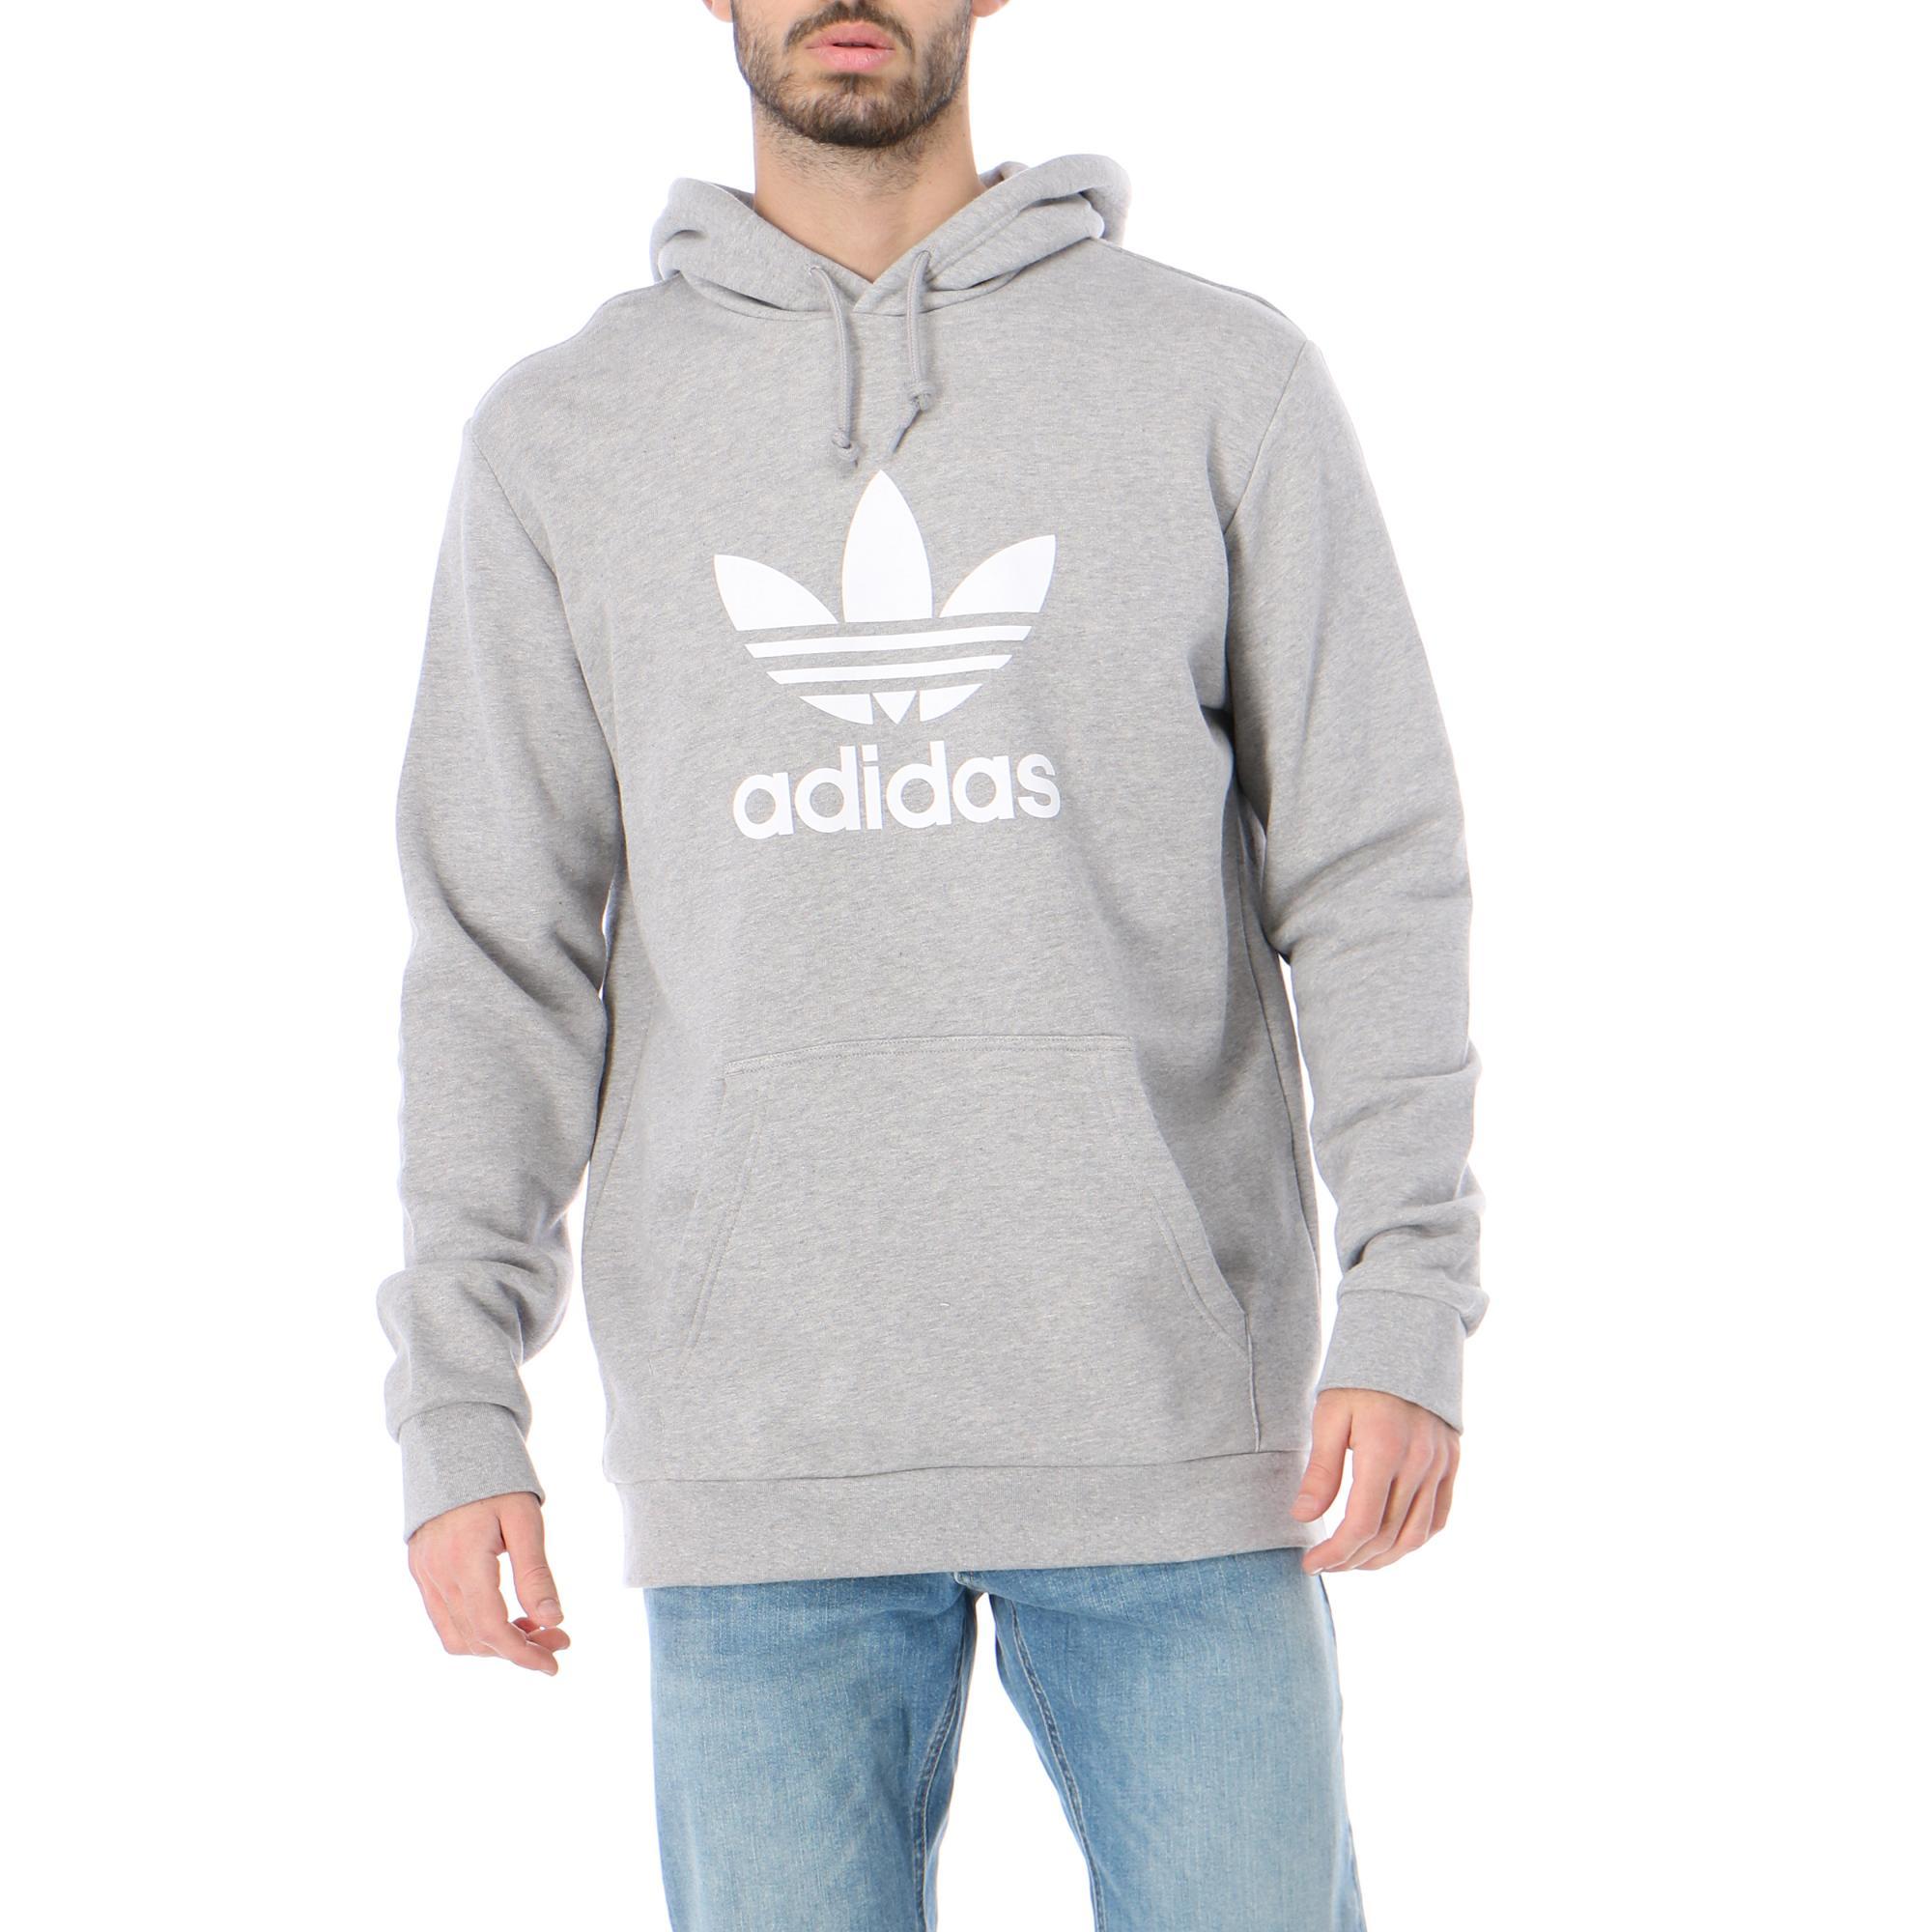 Adidas Trefoil Hoodie Medium grey heather